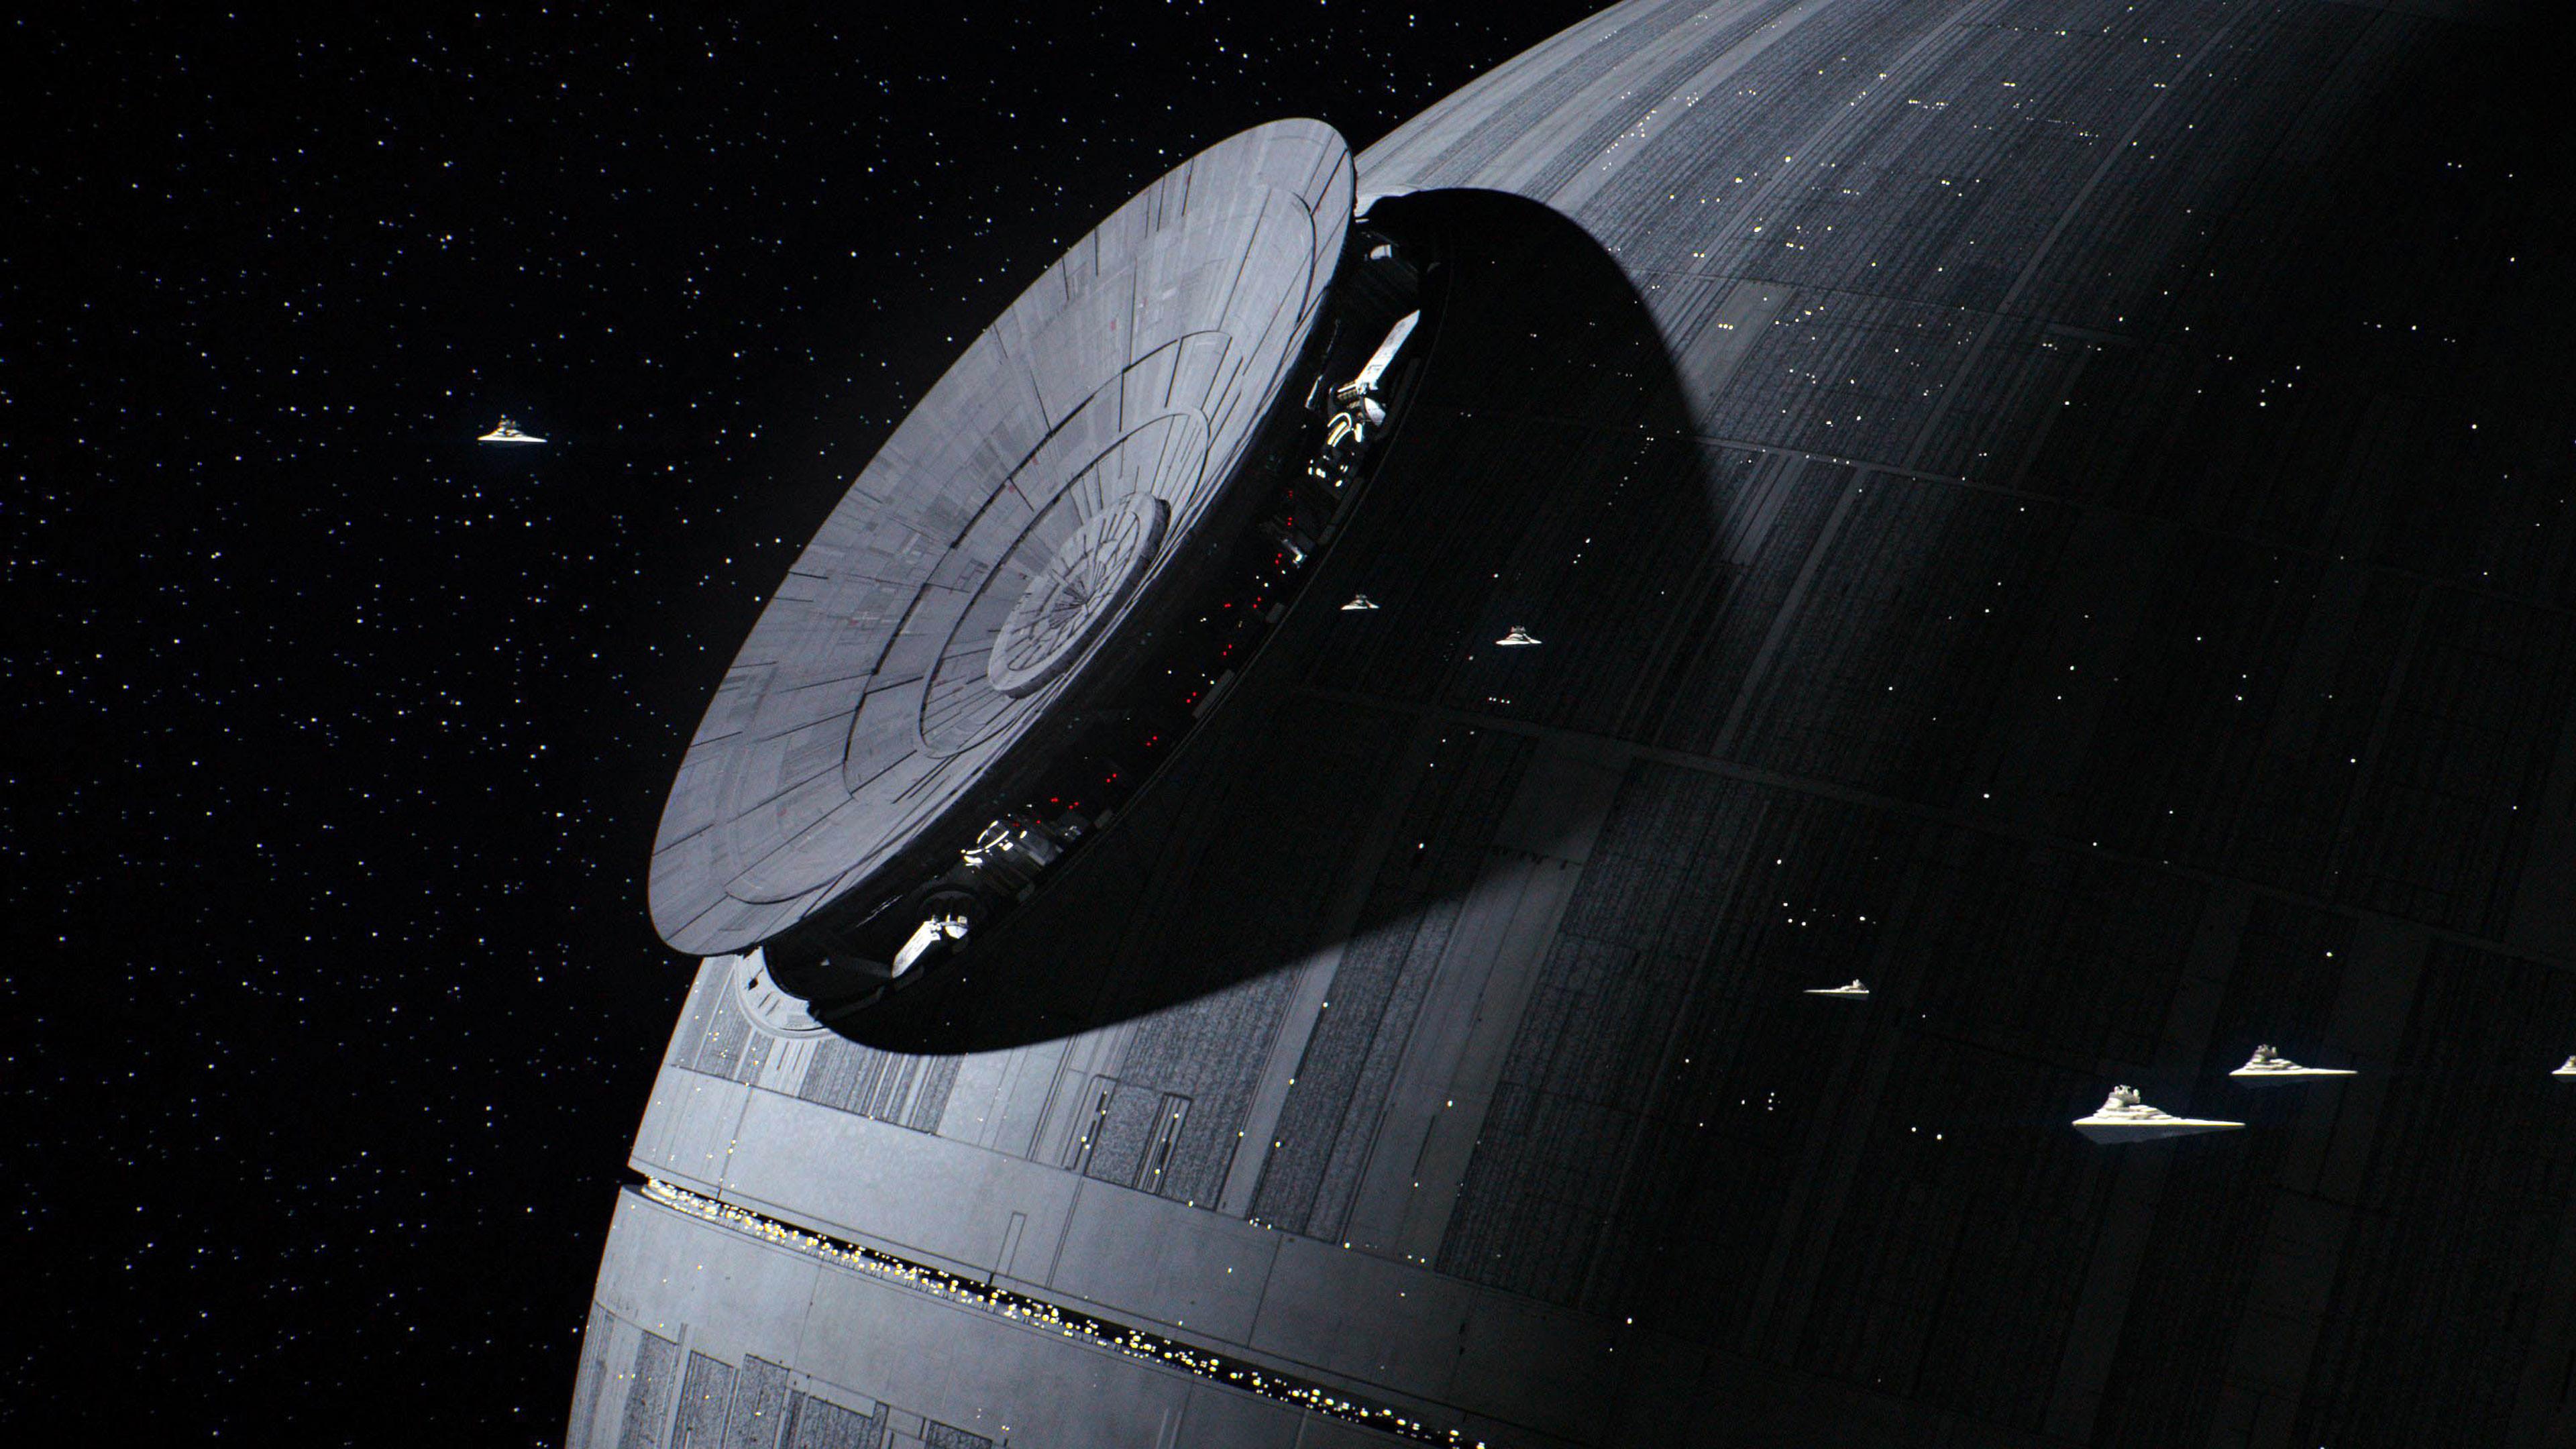 Star Wars Rogue One – Death Star wallpaper